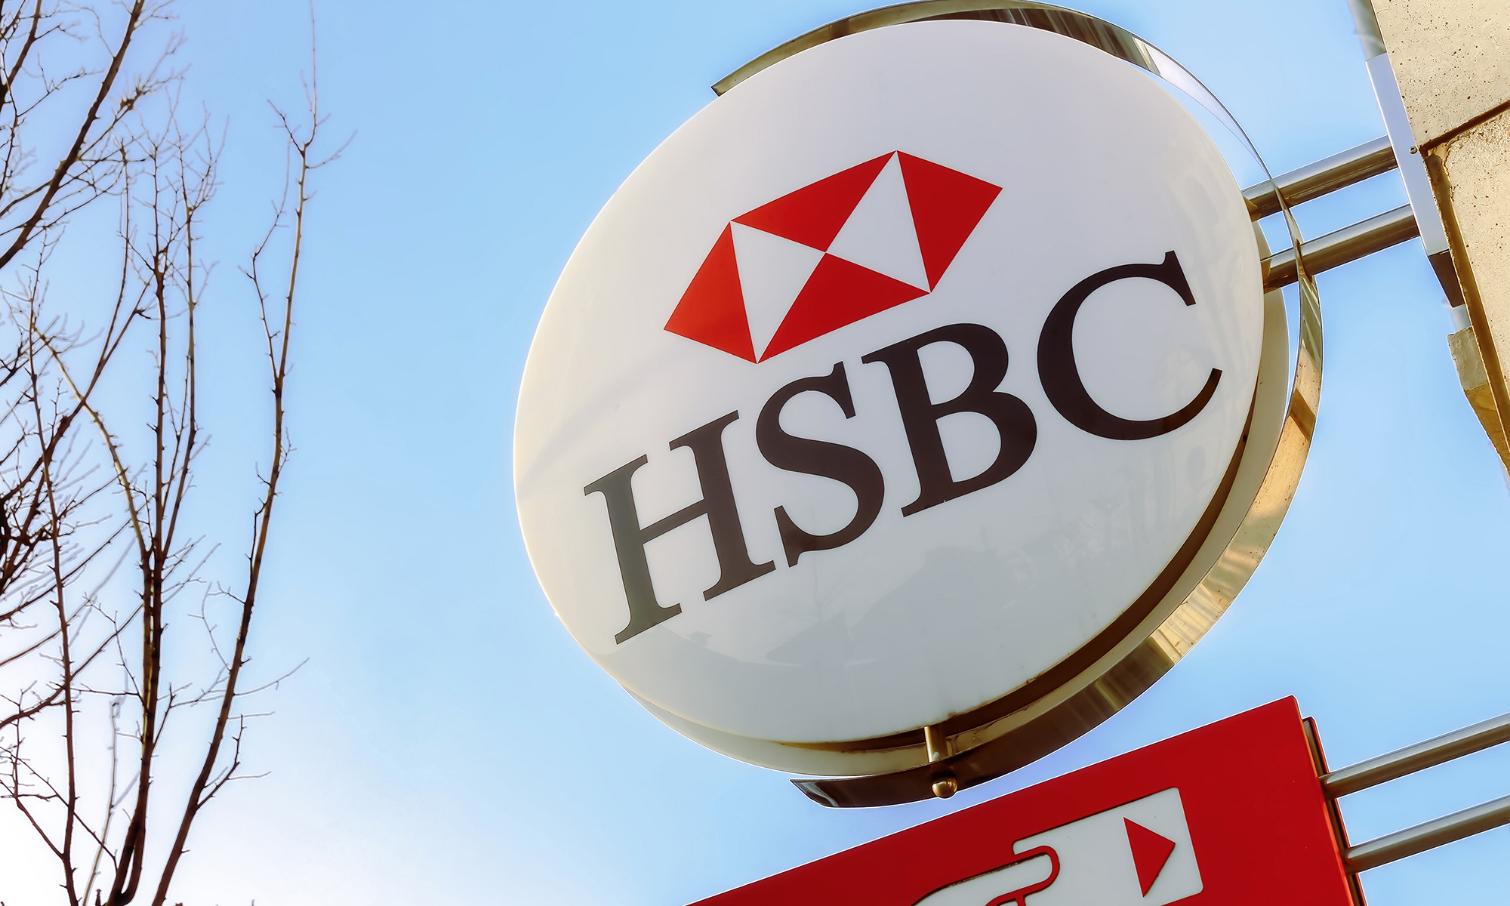 Phishing Texts Target HSBC Bank Customers | Tom's Guide